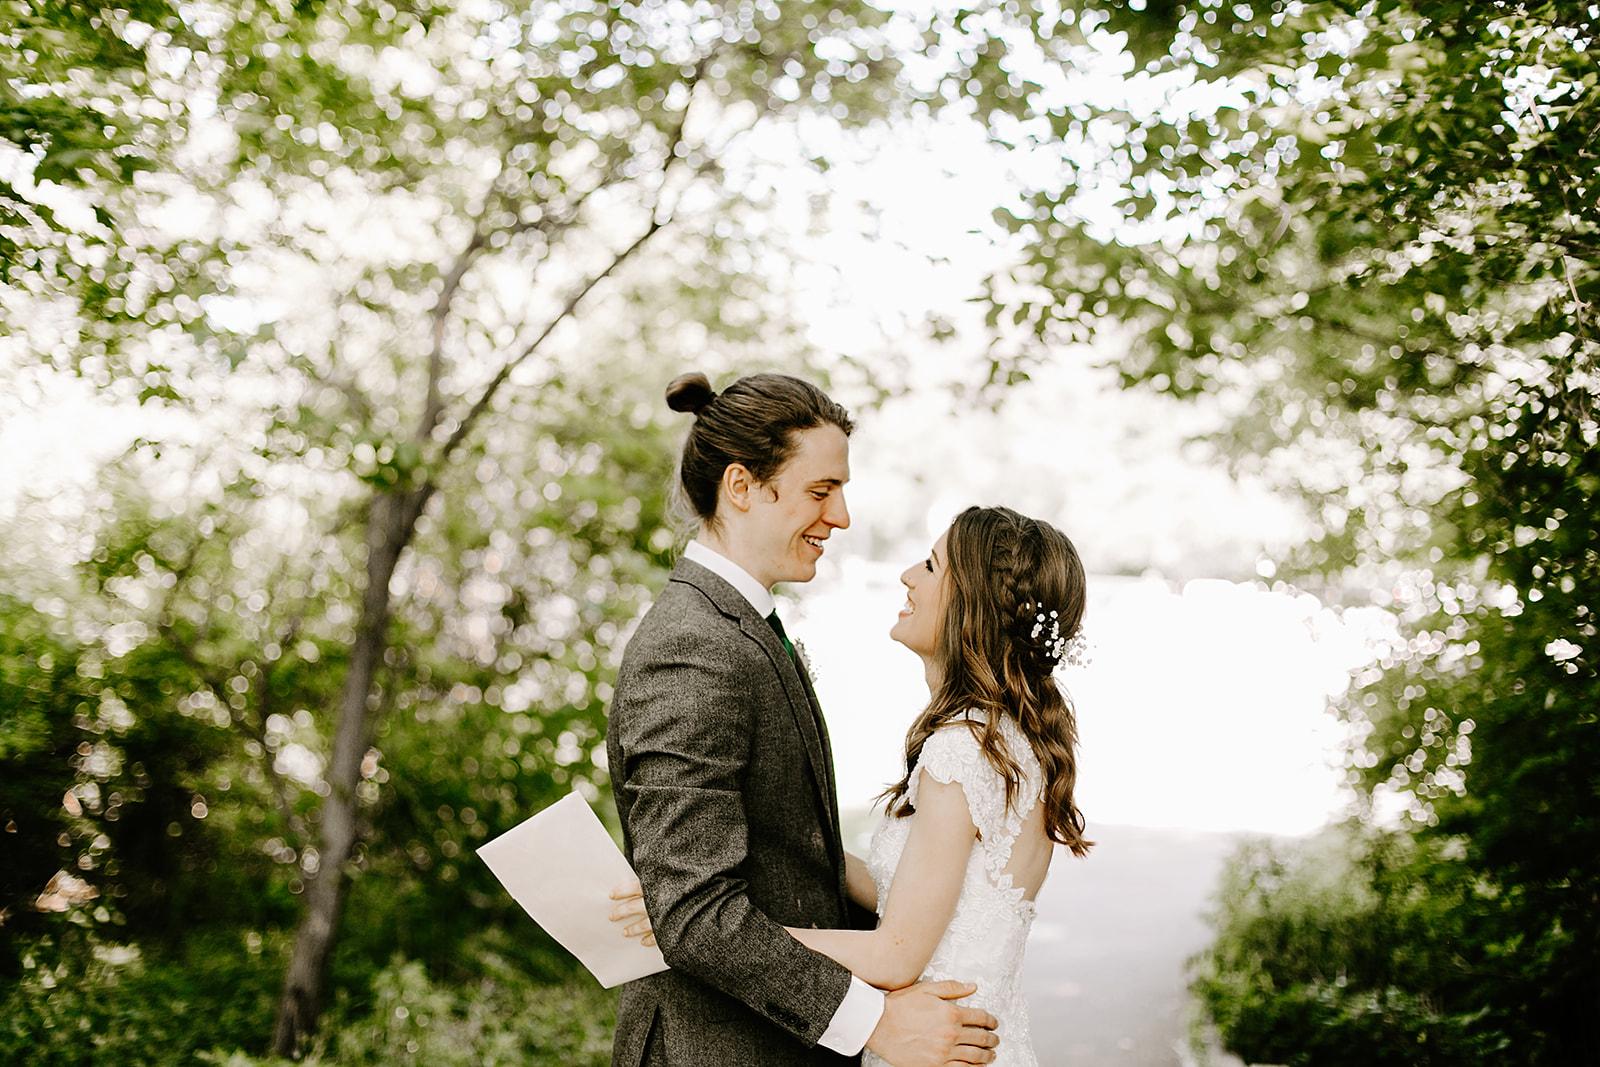 Lily and Easton Wedding Carmel Indiana Cool Creek Park Grace Church Emily Elyse Wehner Photography -100.jpg